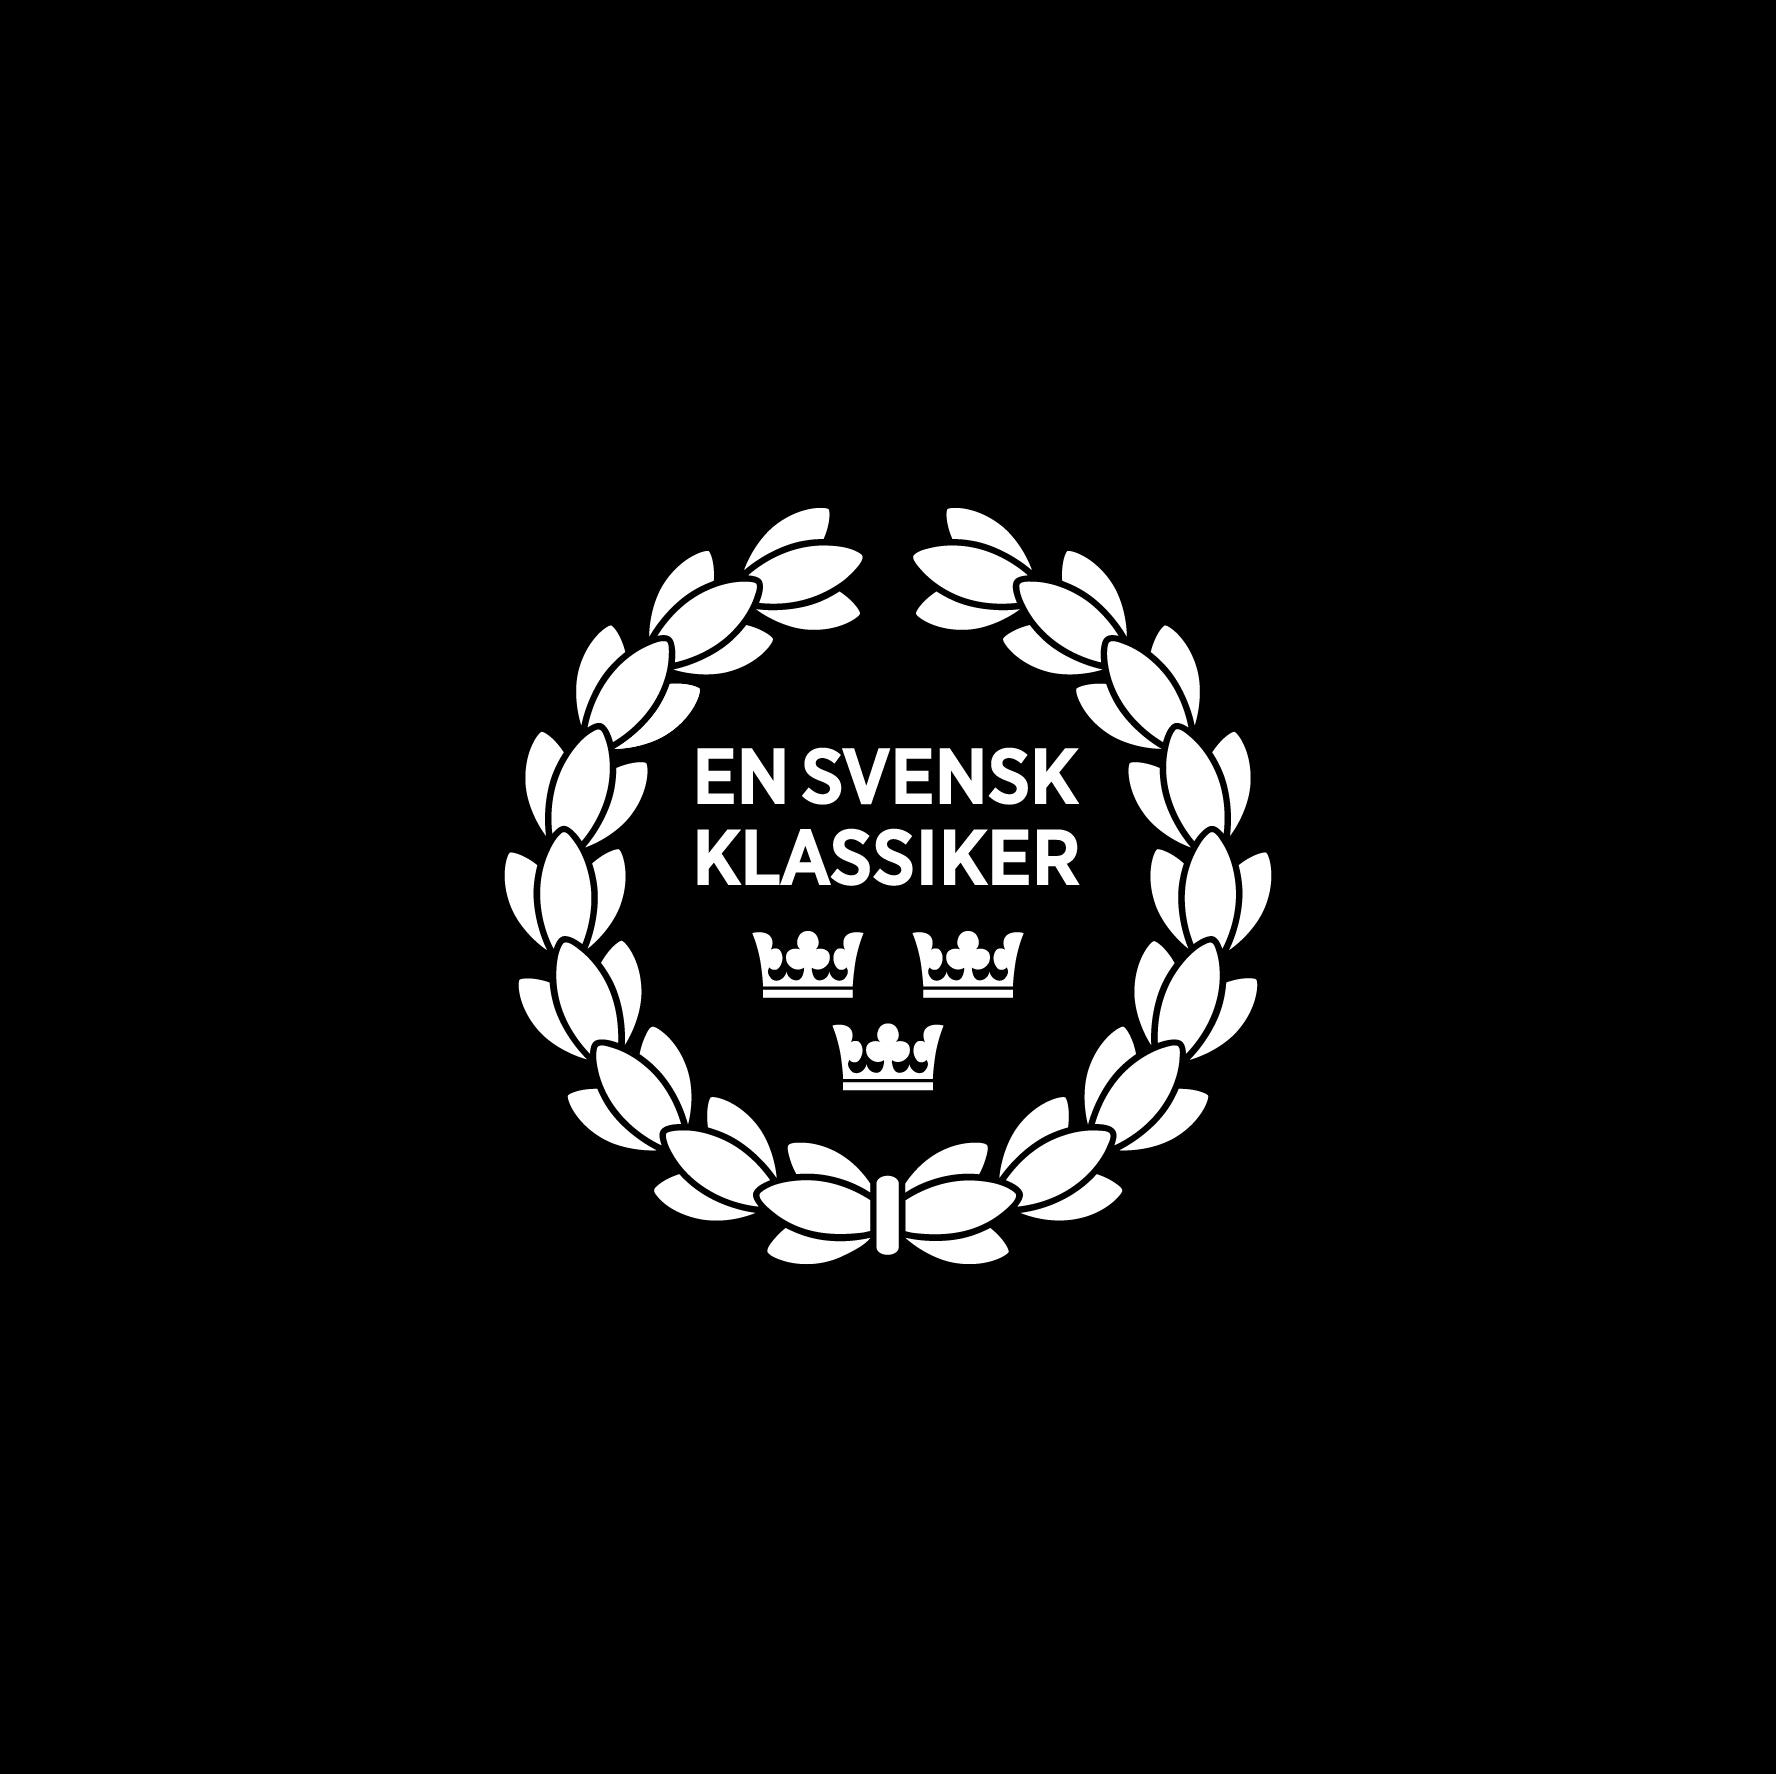 logo for En svensk klassiker